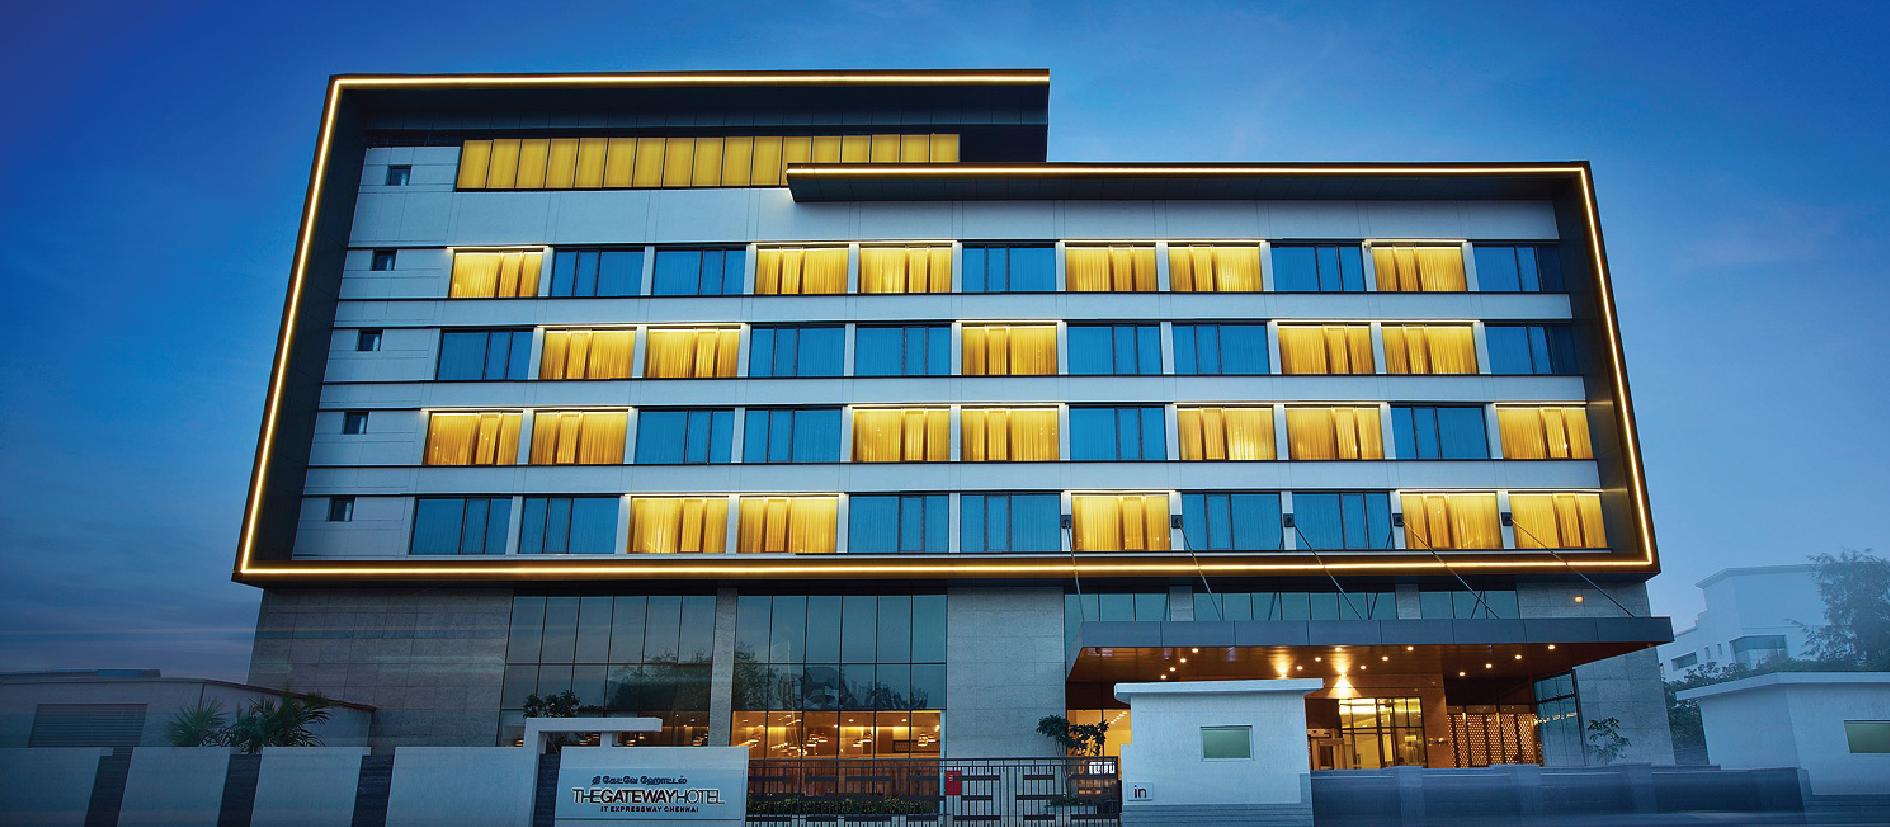 chennai hotels list address